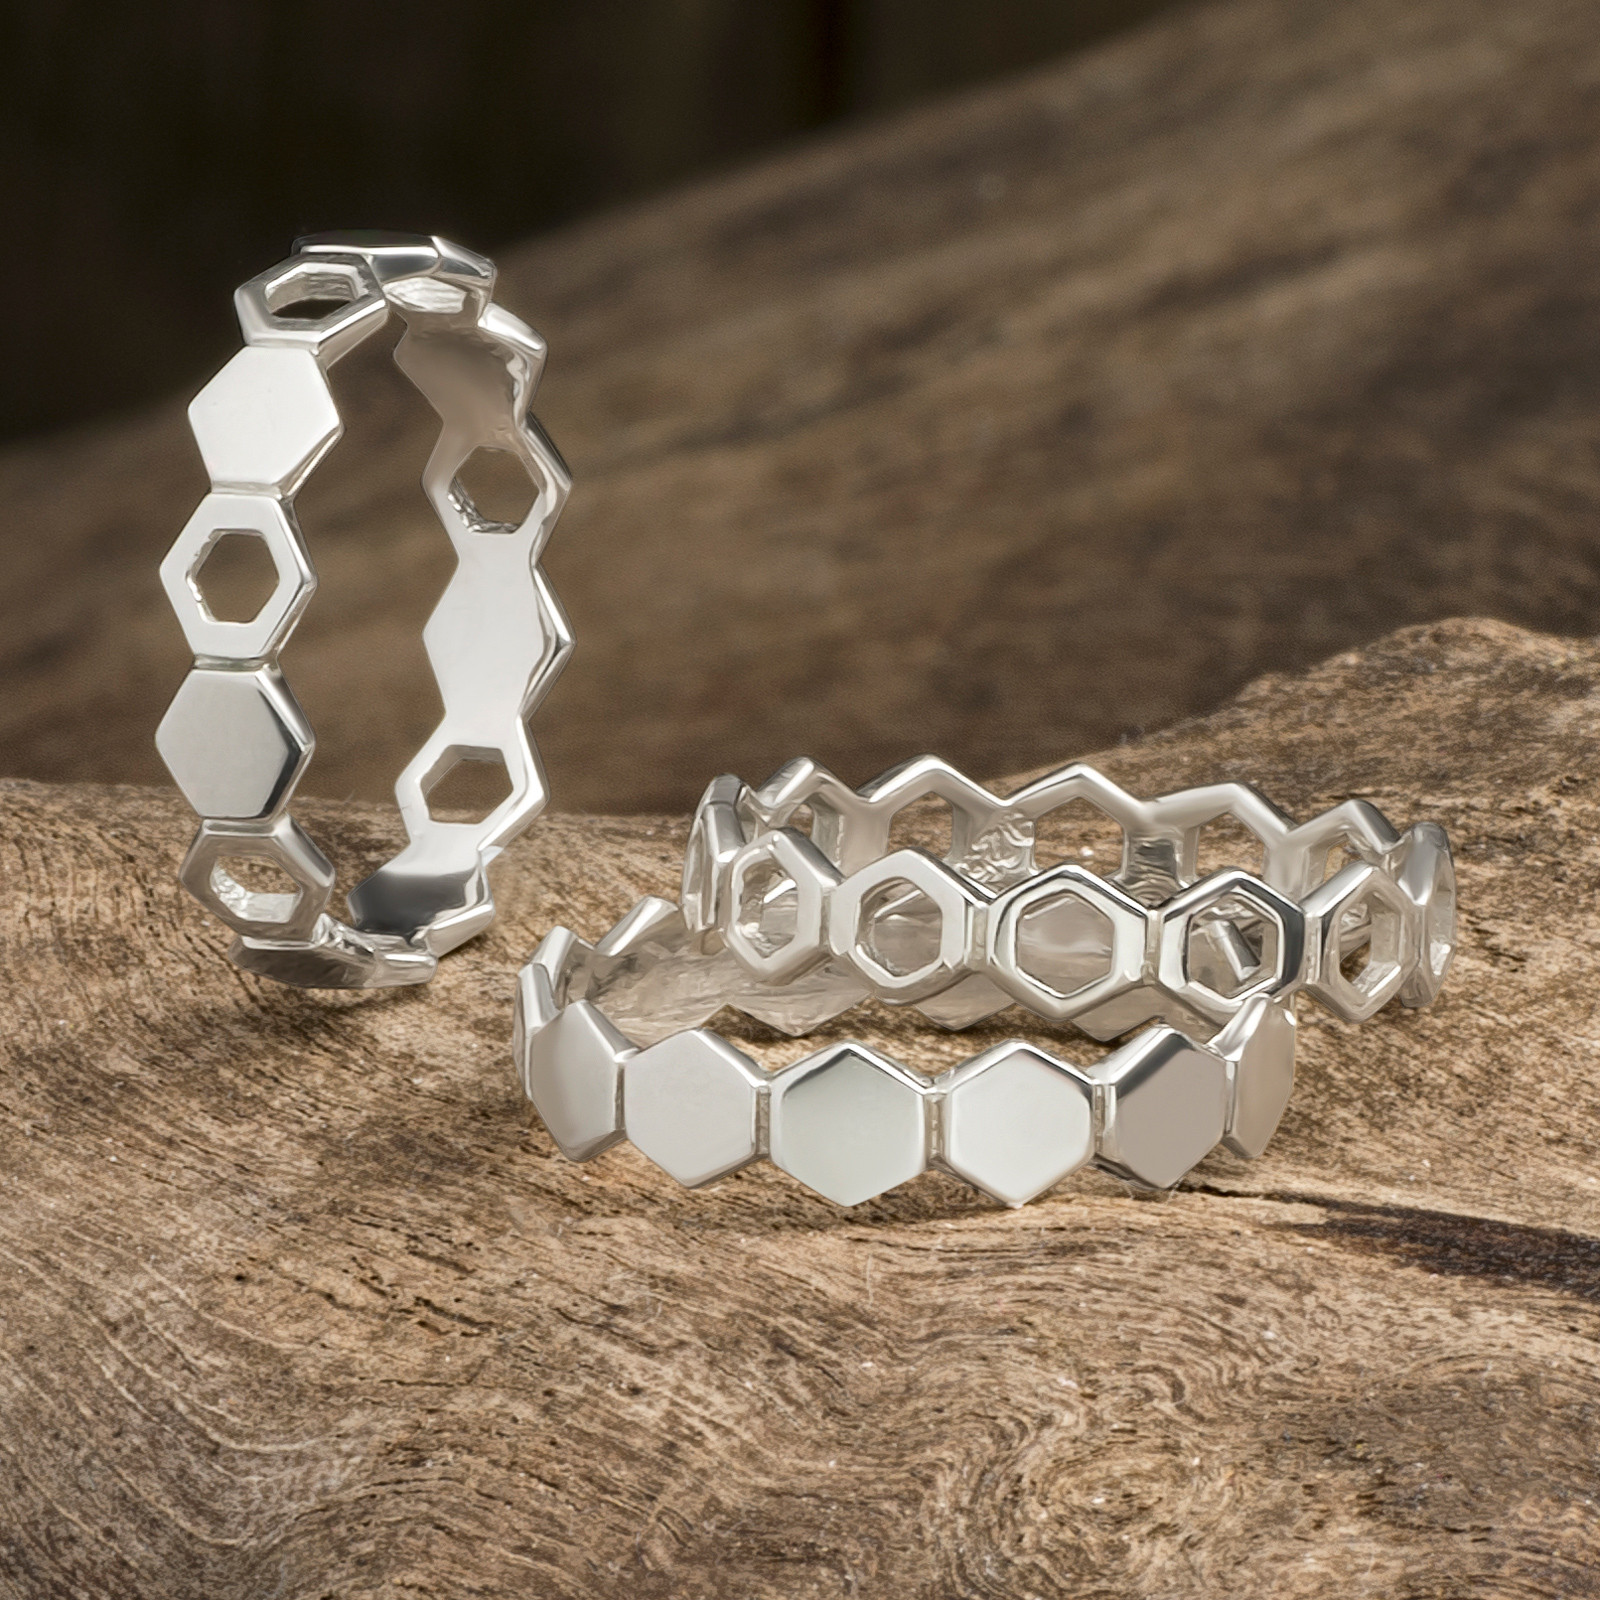 honeycomb-stacking-rings3-design-martin-